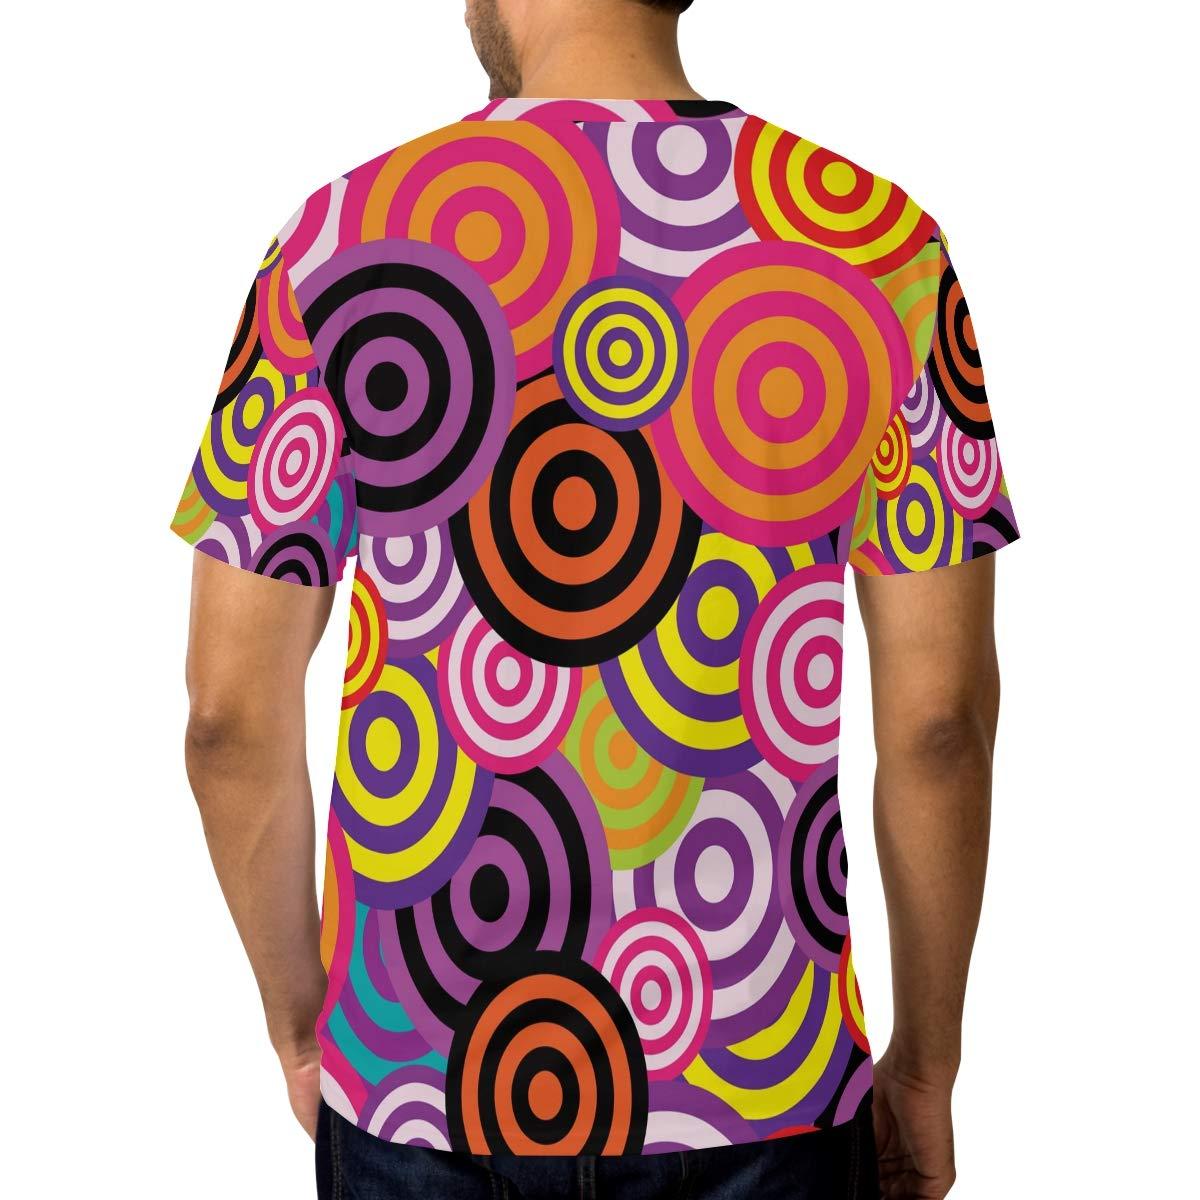 Nanmma Twelve Constellations Galaxy Print Fashion Men 3D T-Shirt Summer Short Sleeve Casual Tees T Shirt Blouse